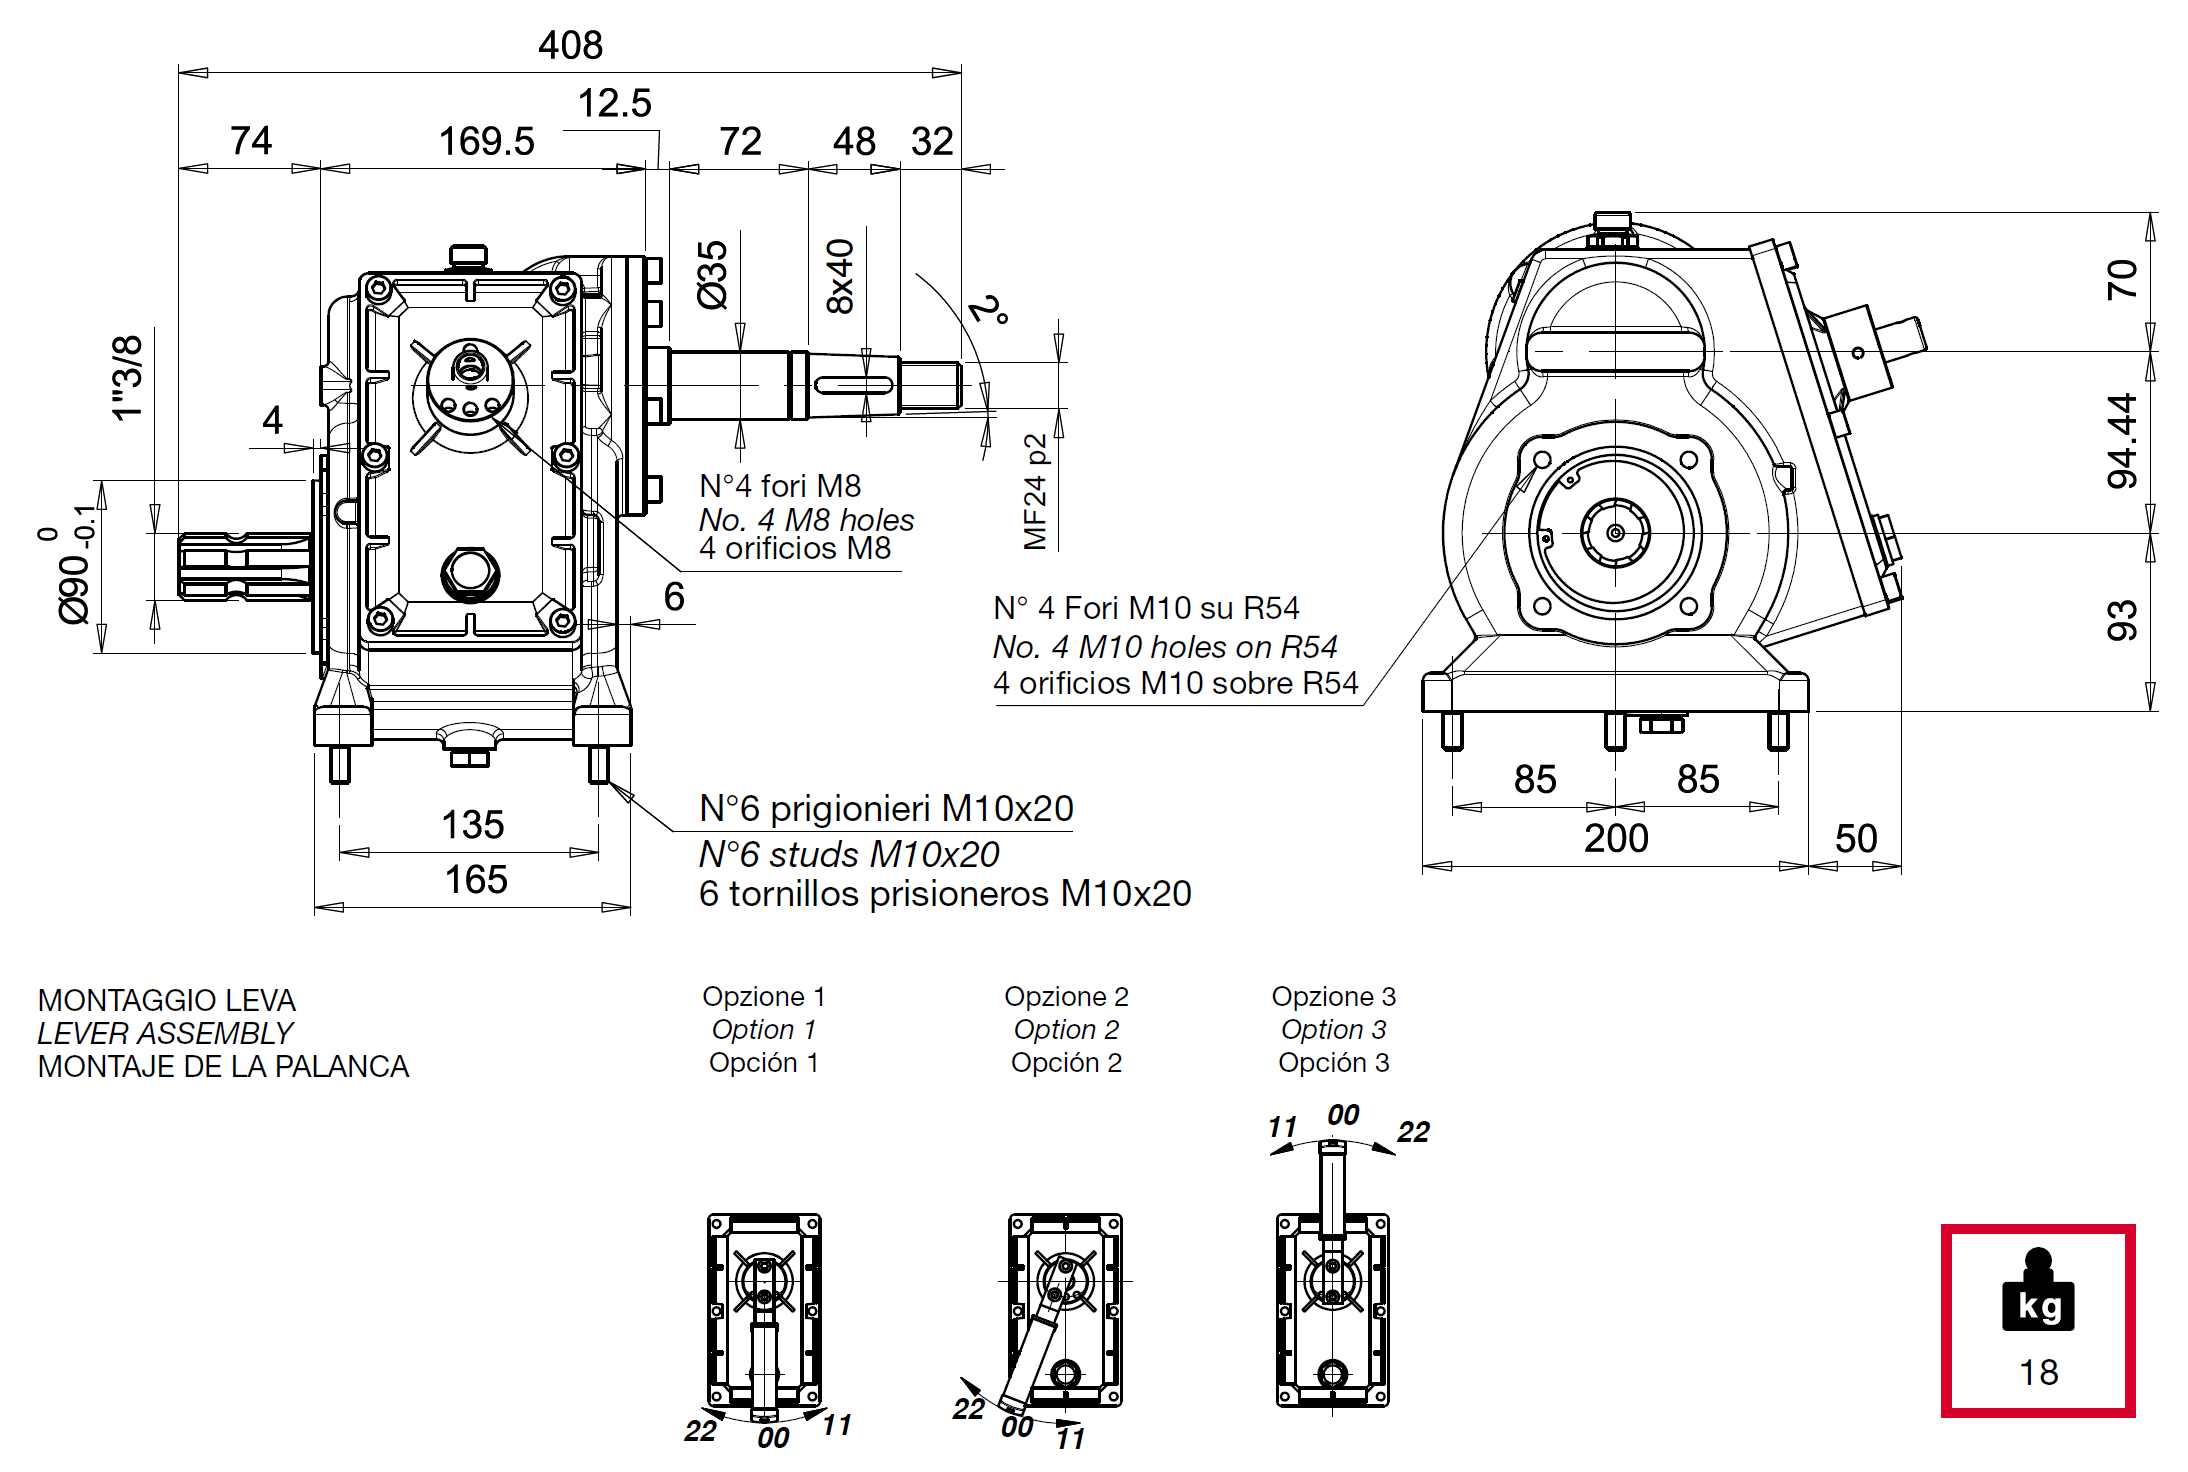 CM9 N A 913 disegno